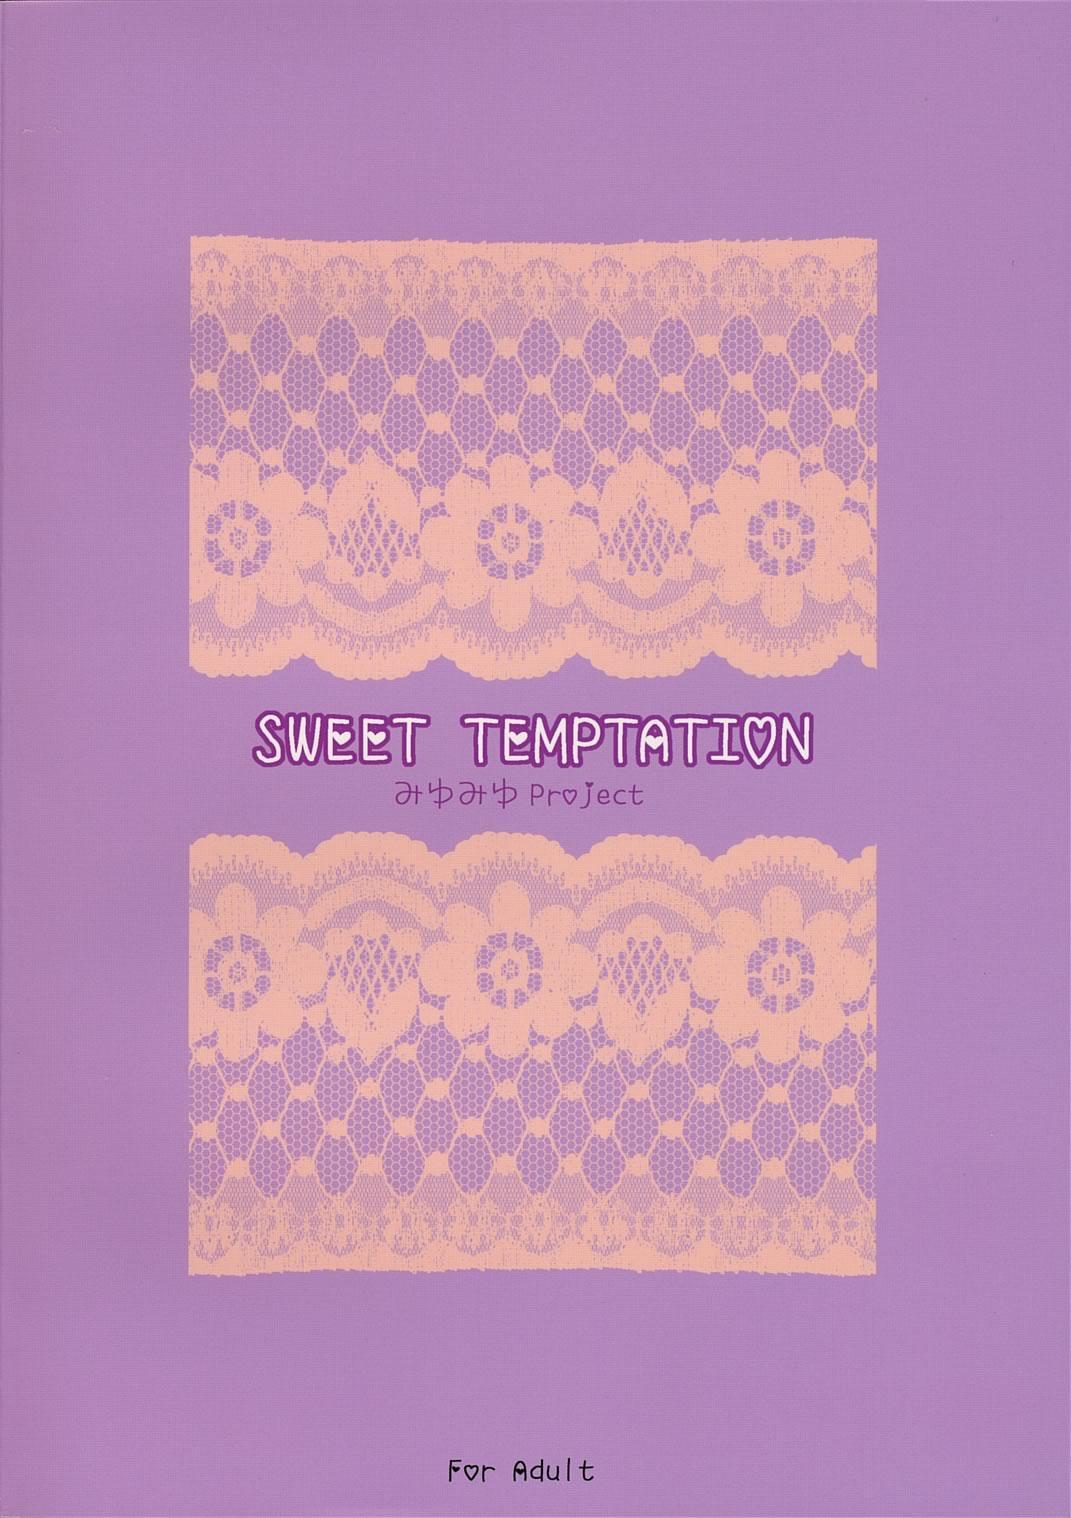 SWEET TEMPTATION 37